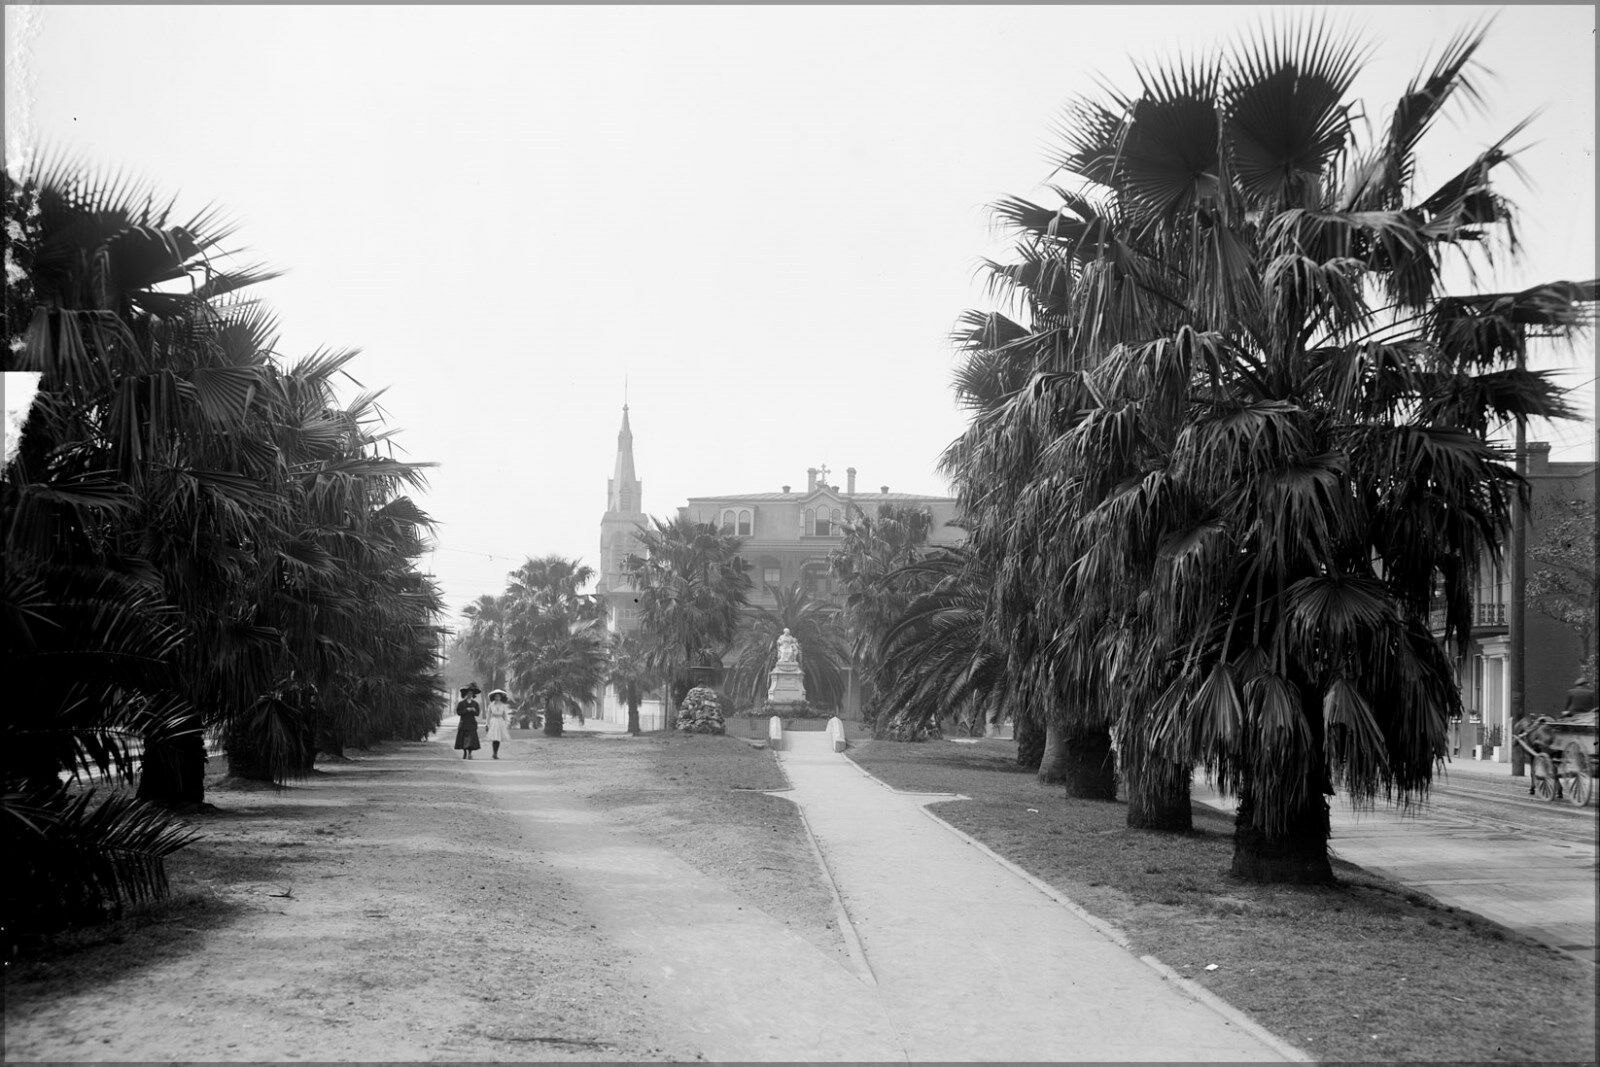 Poster, Poster, Poster, Molte Misure; Margaret Monument e Park New Orleans intorno Al 3e6bee